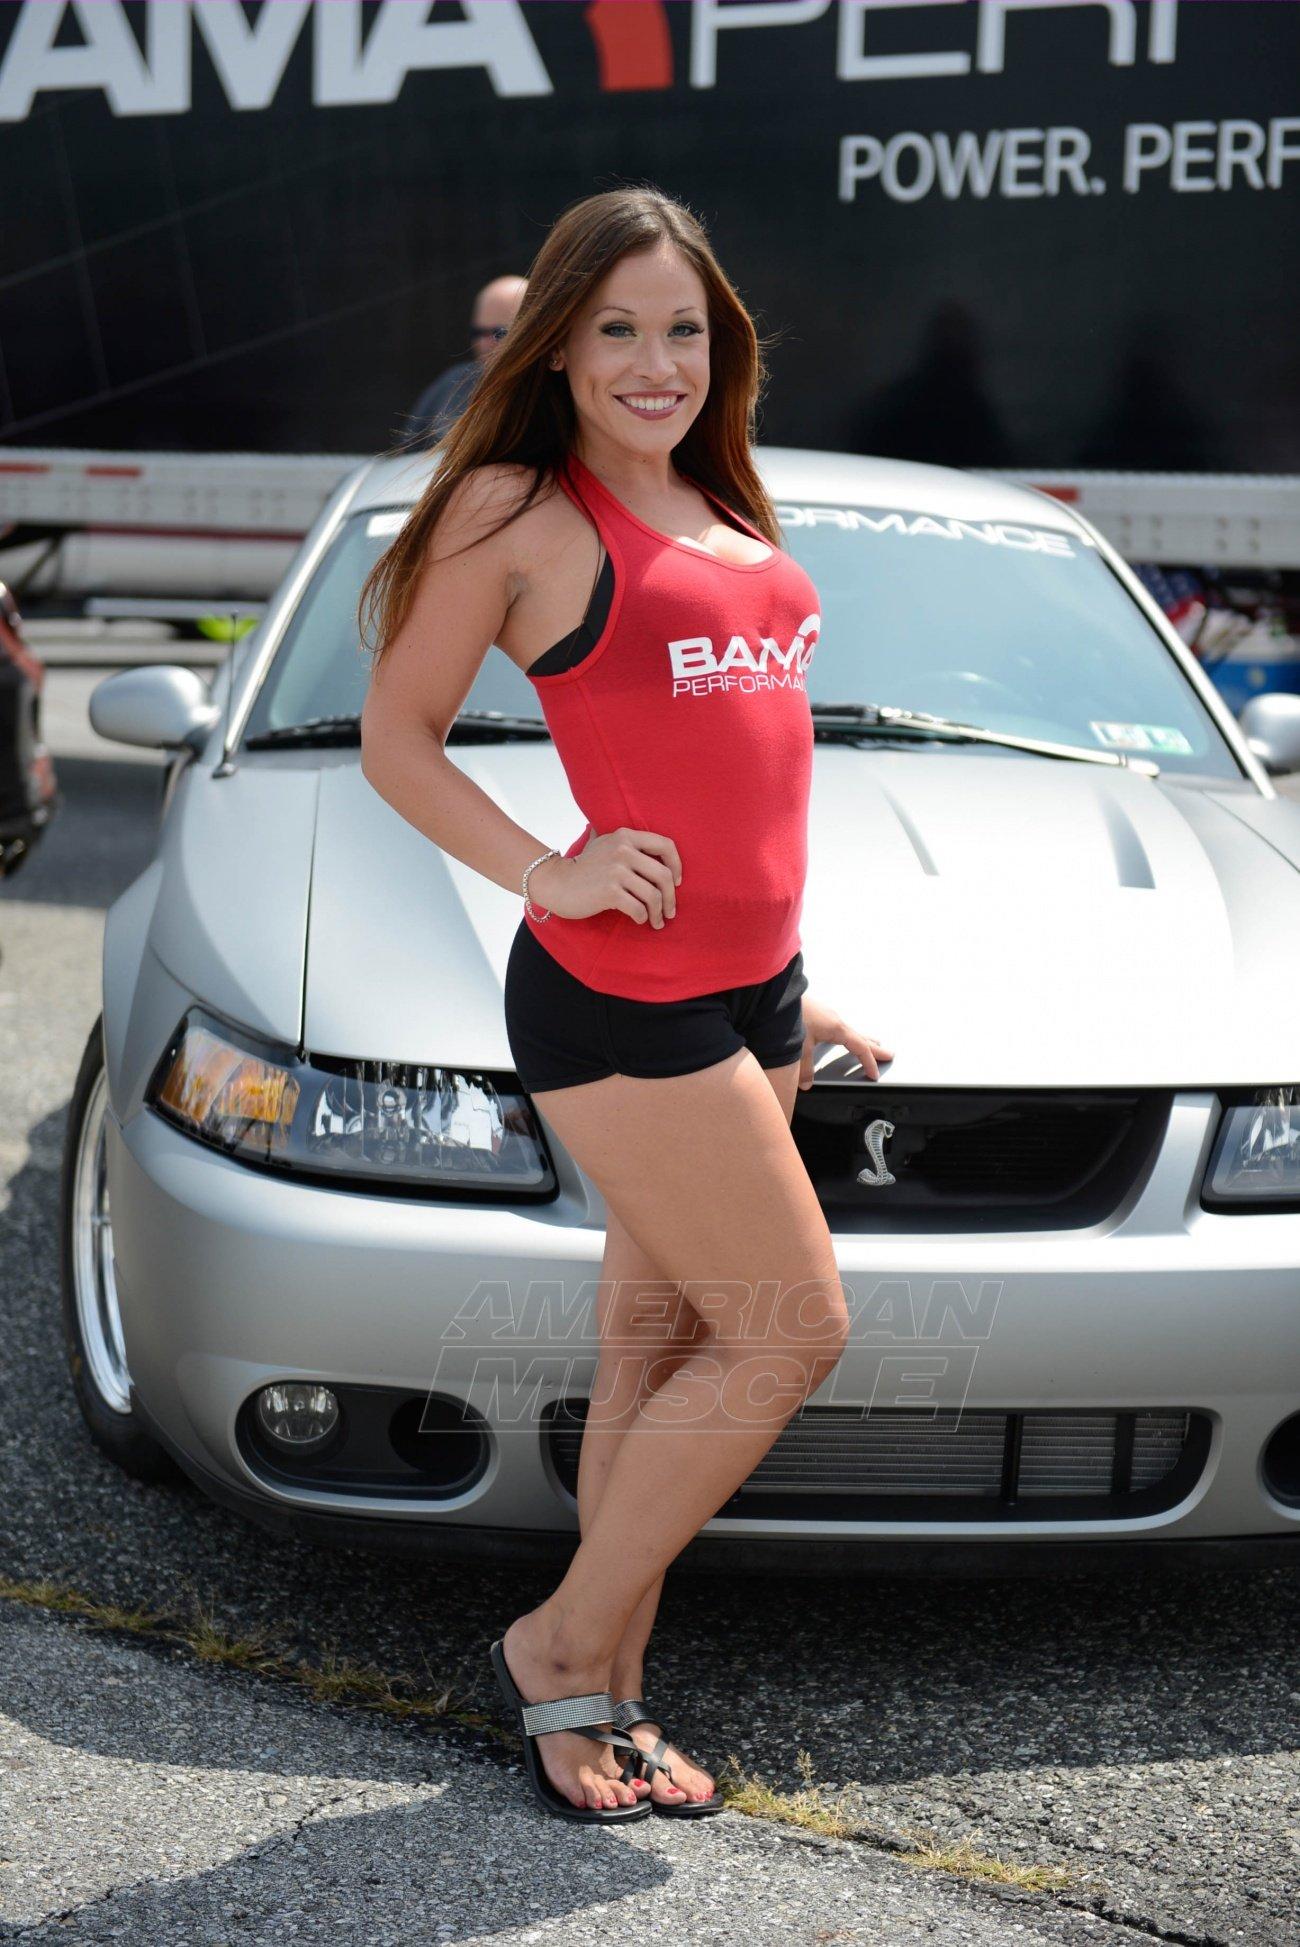 American Muscle Car Show Photos Car News - Muscle car show